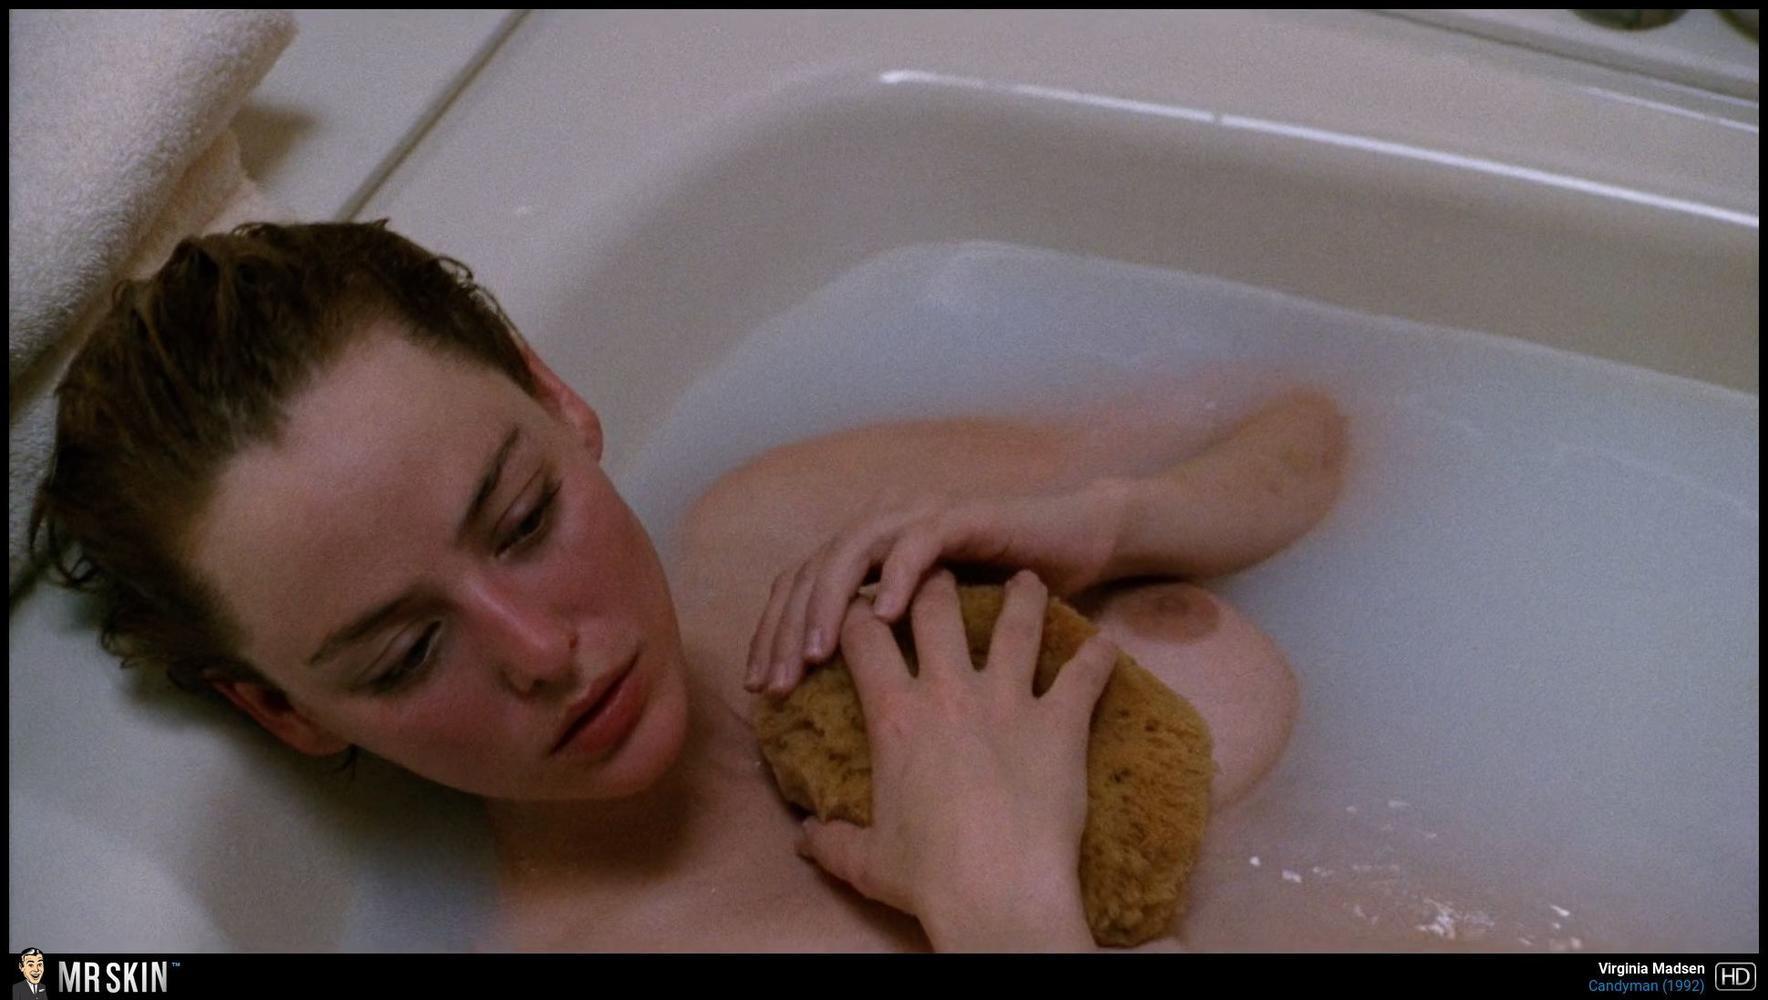 Swimsuit Jennifer Lowery Nude Photos Pic